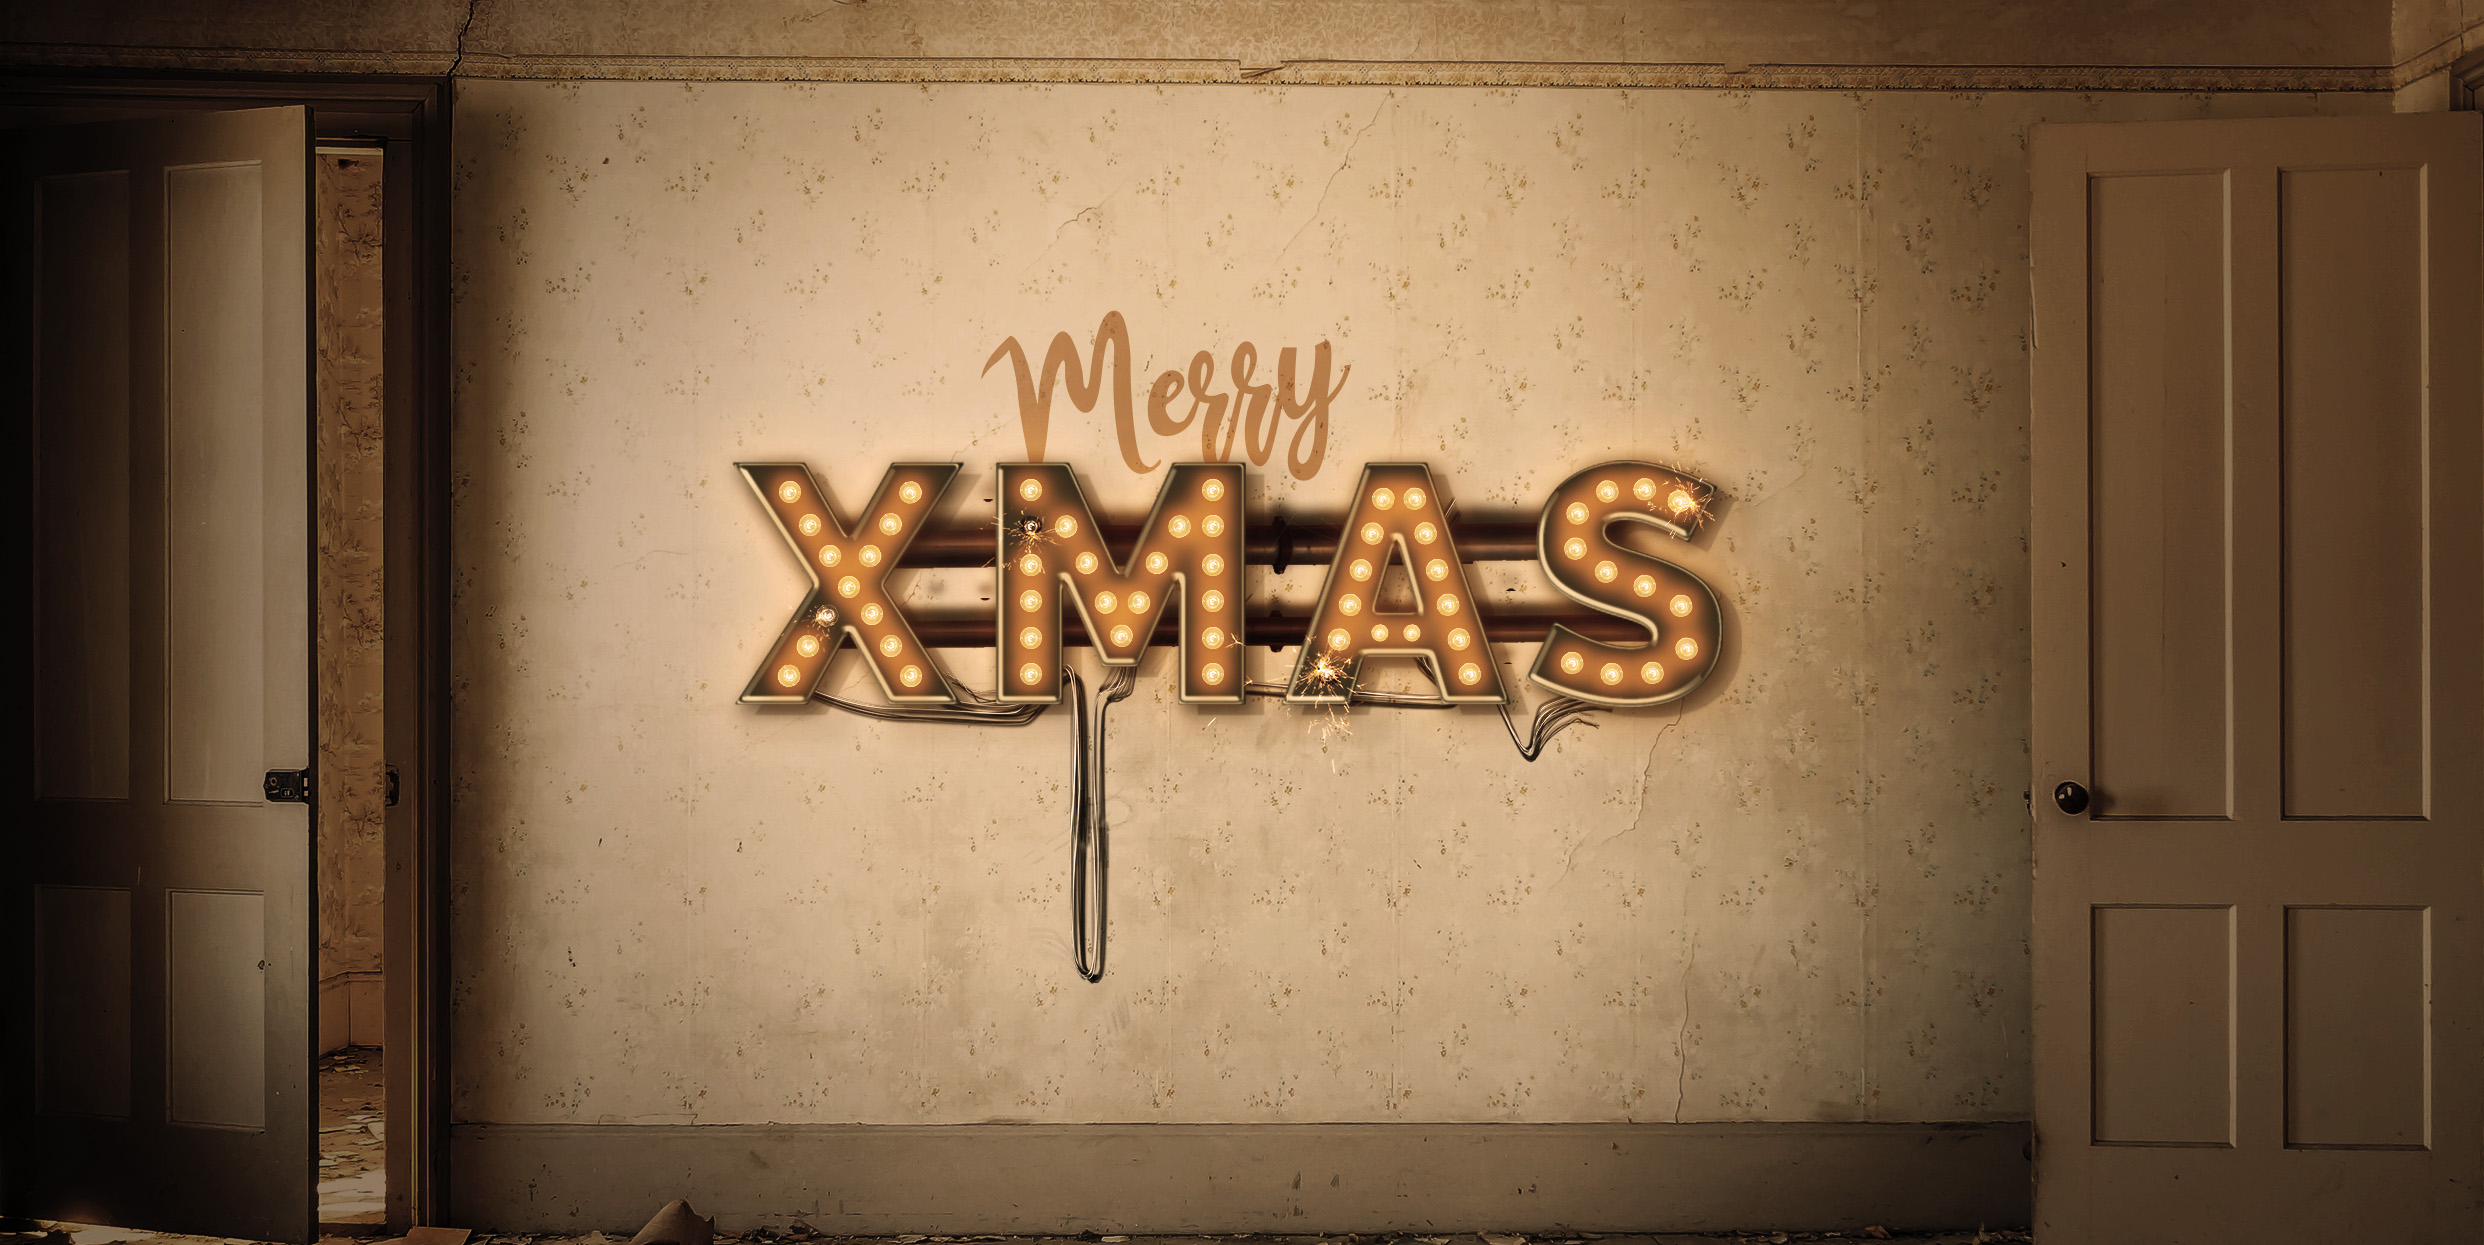 Lightbulb Merry Christmas Signs | 14-Image Bundle example image 6